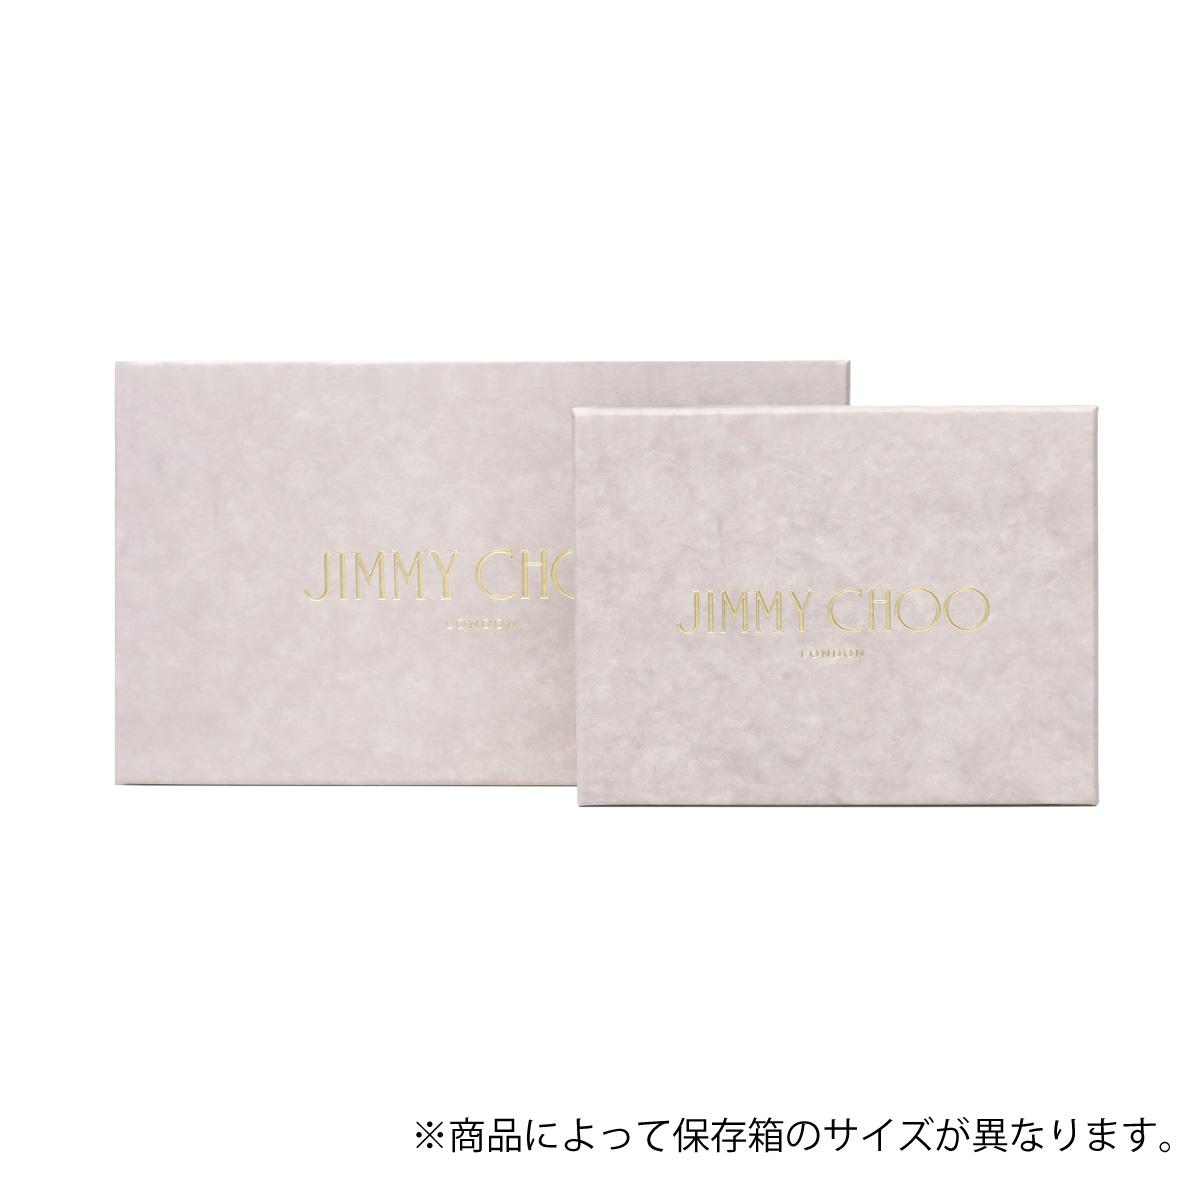 JIMMY CHOO ジミー チュウ | カードケース | LISE リセ